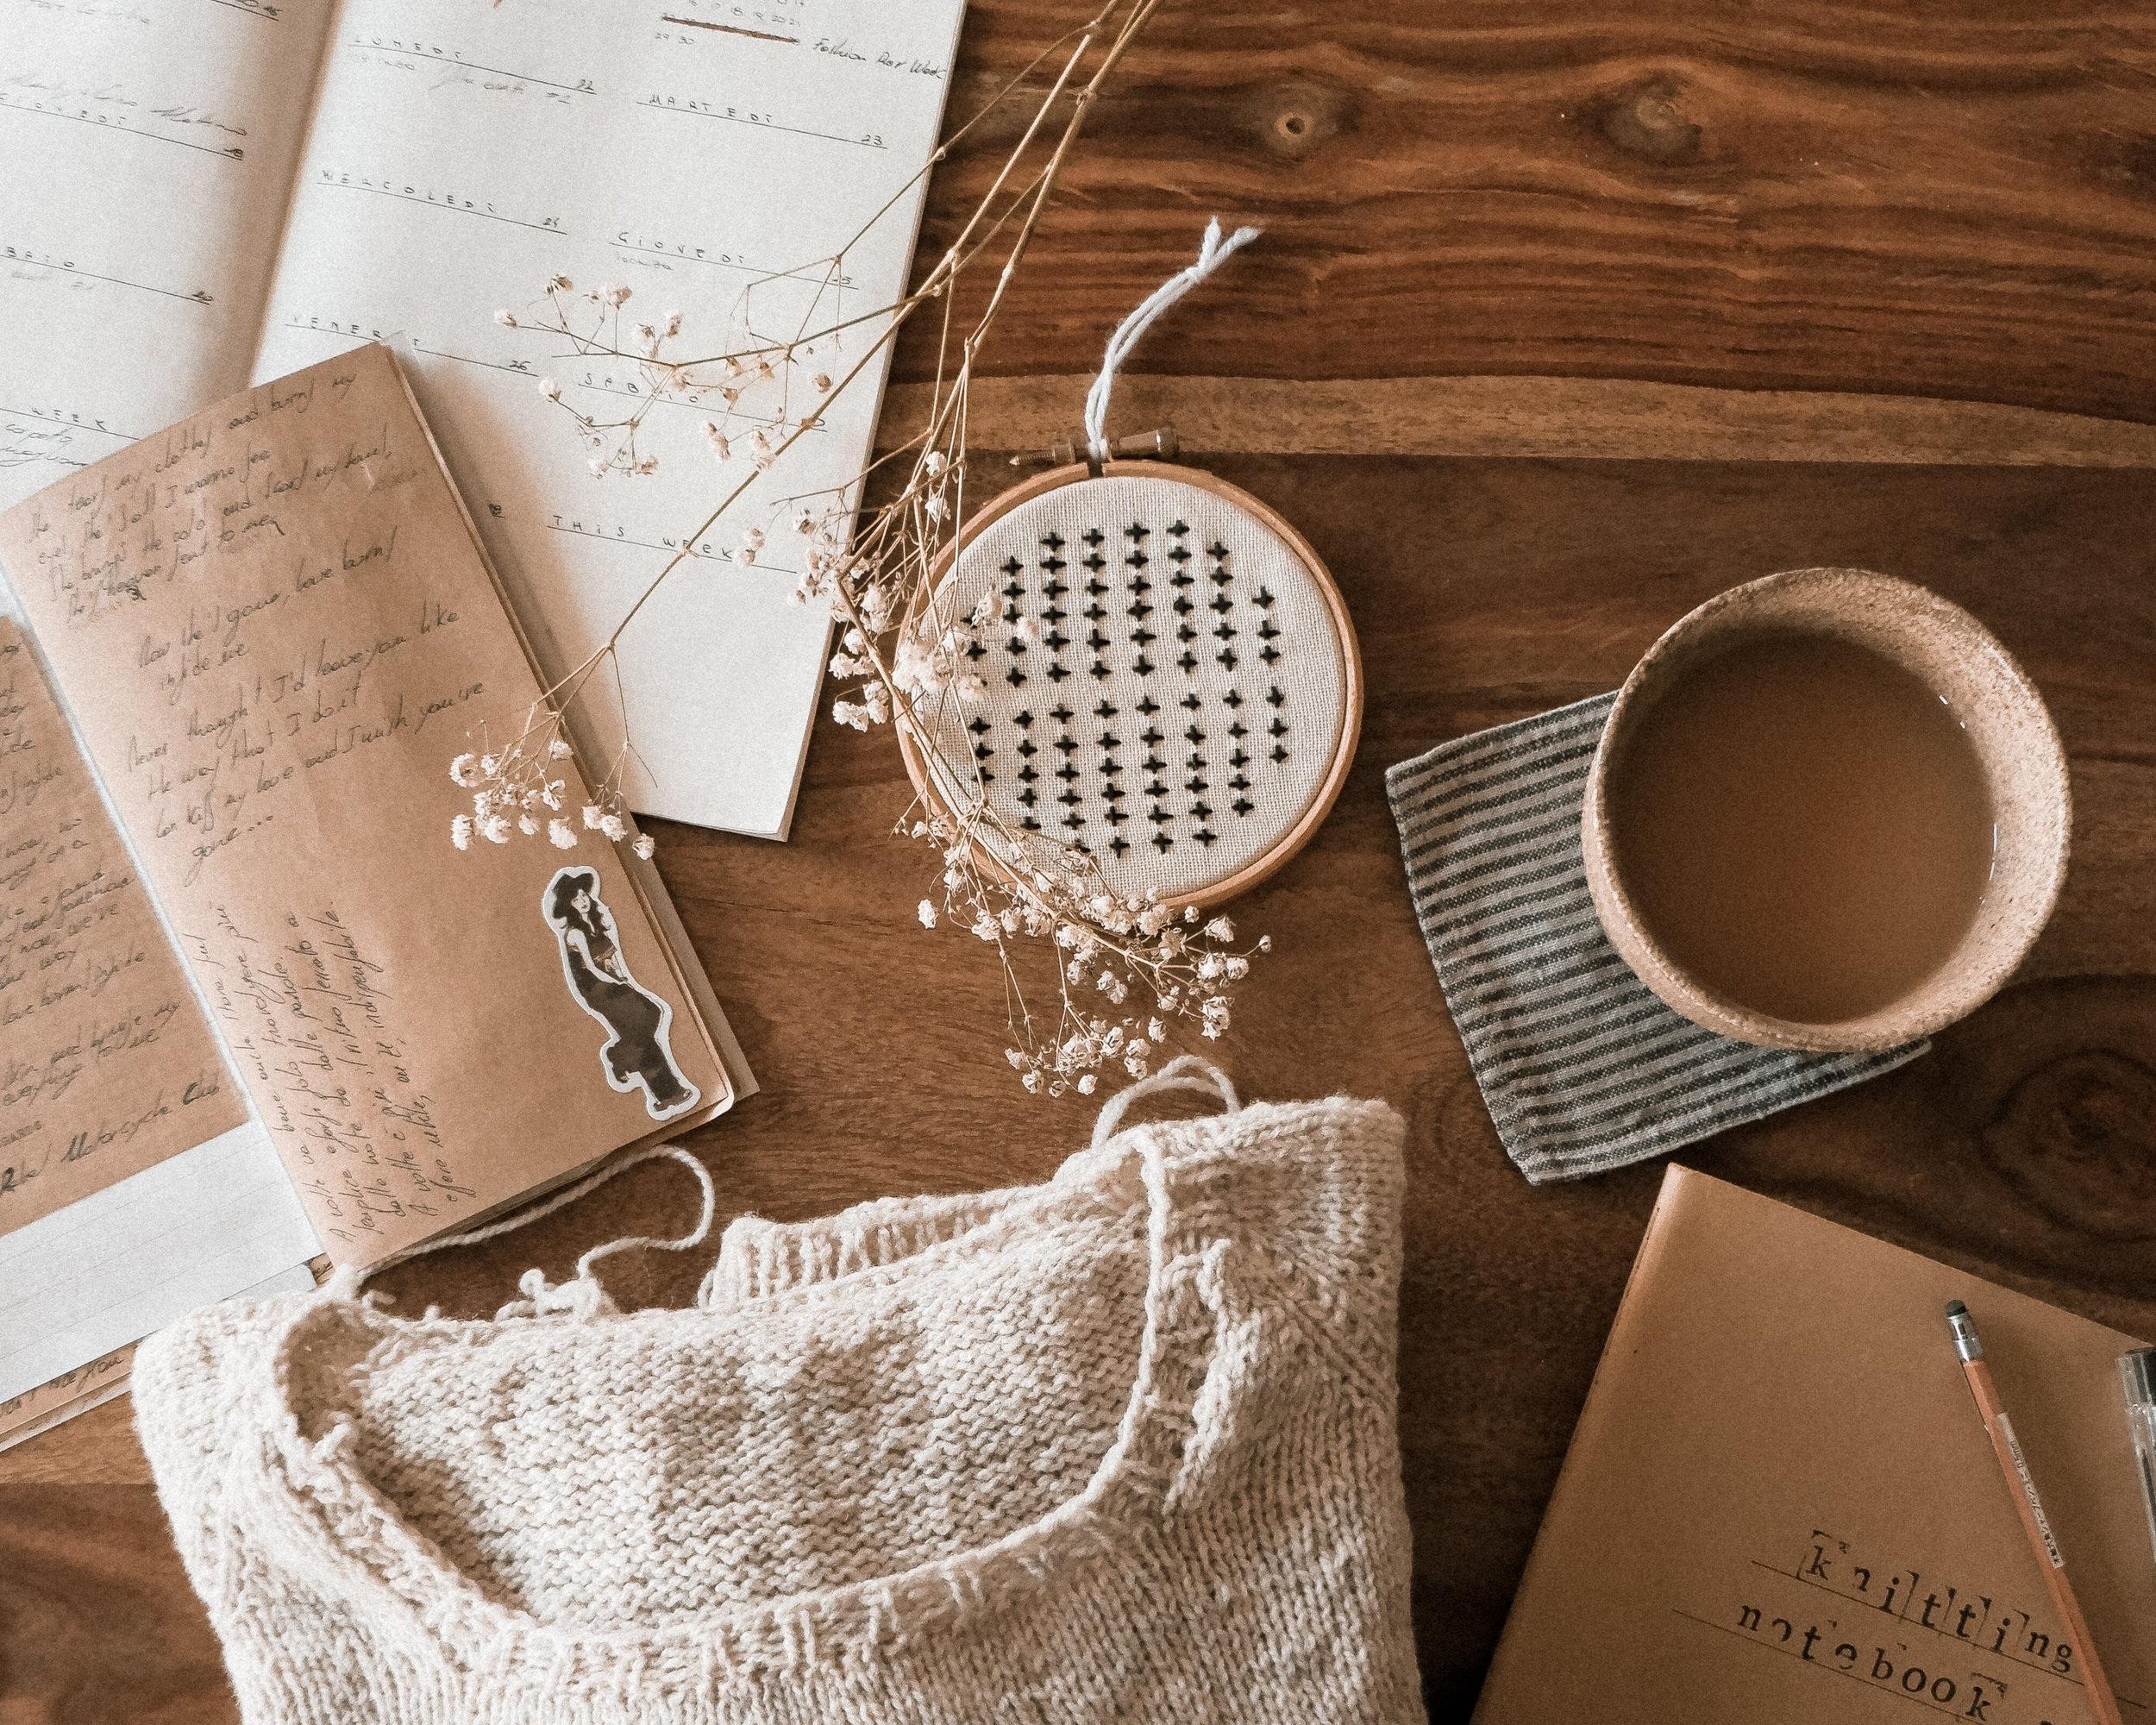 journaling, expressive journaling, creativity, shadow work